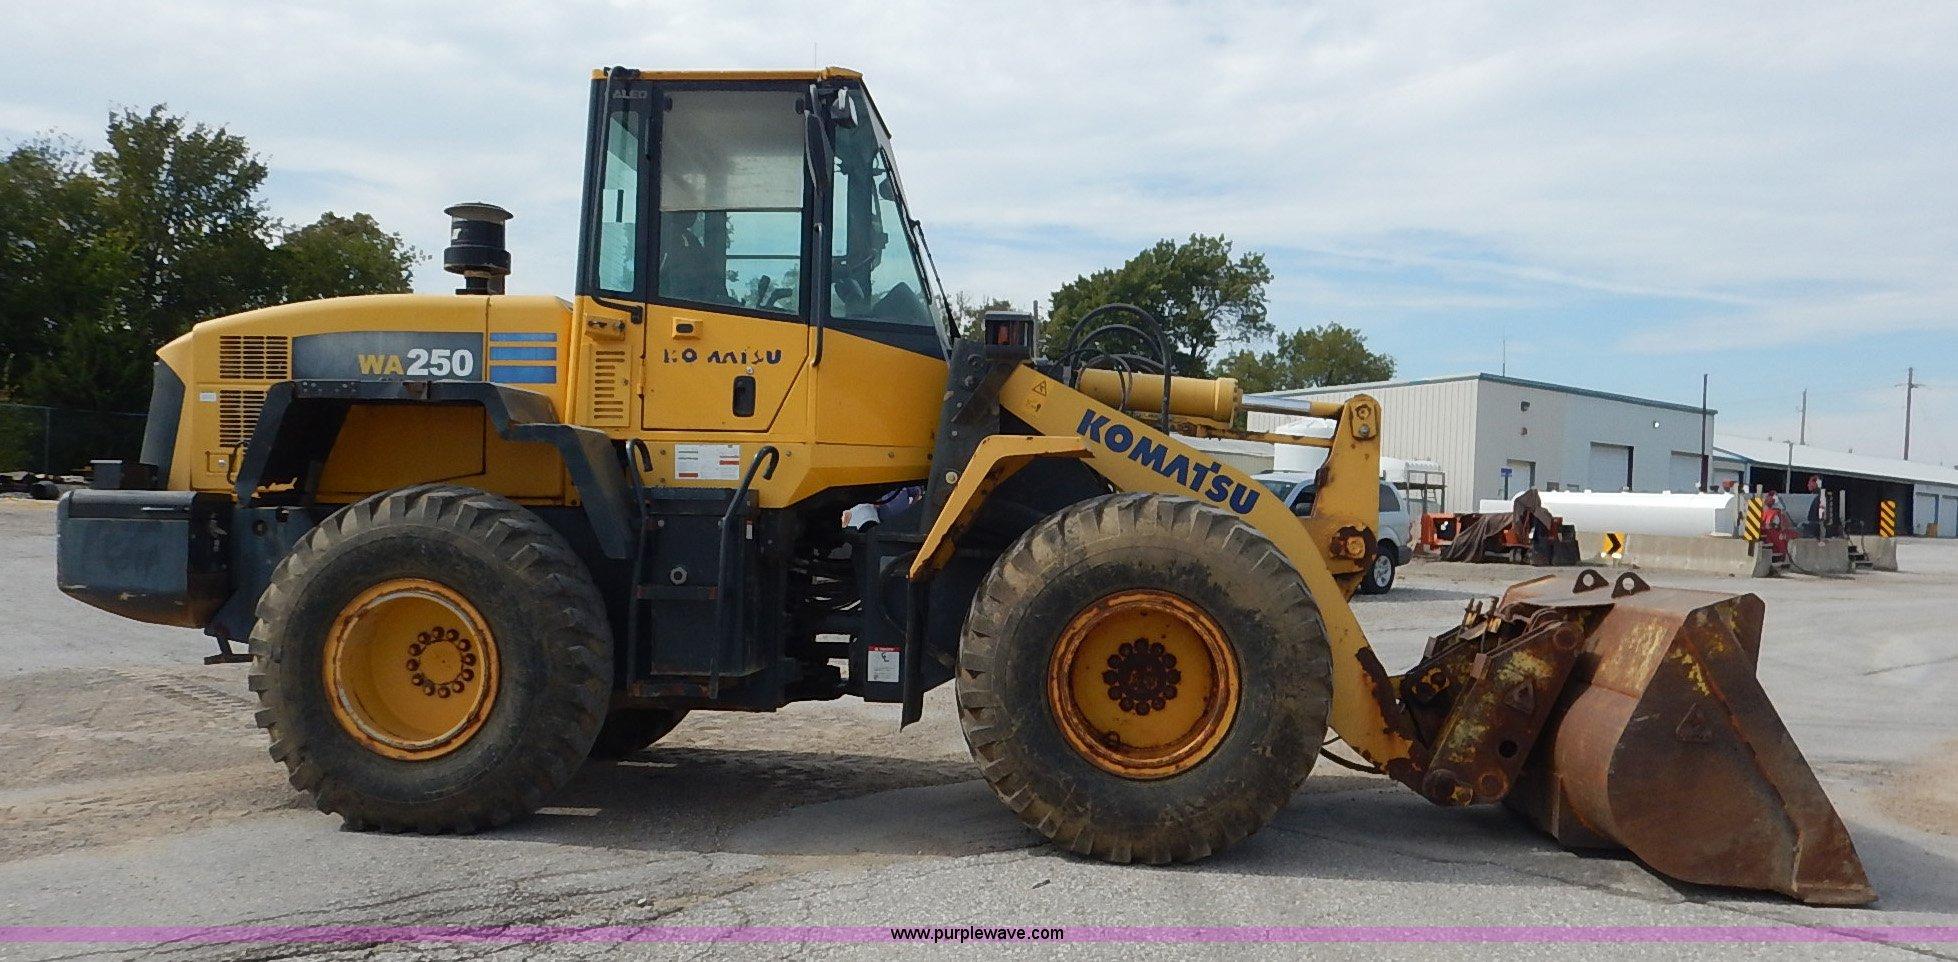 2004 Komatsu WA250-5L wheel loader   Item J6397   SOLD! Nove... on